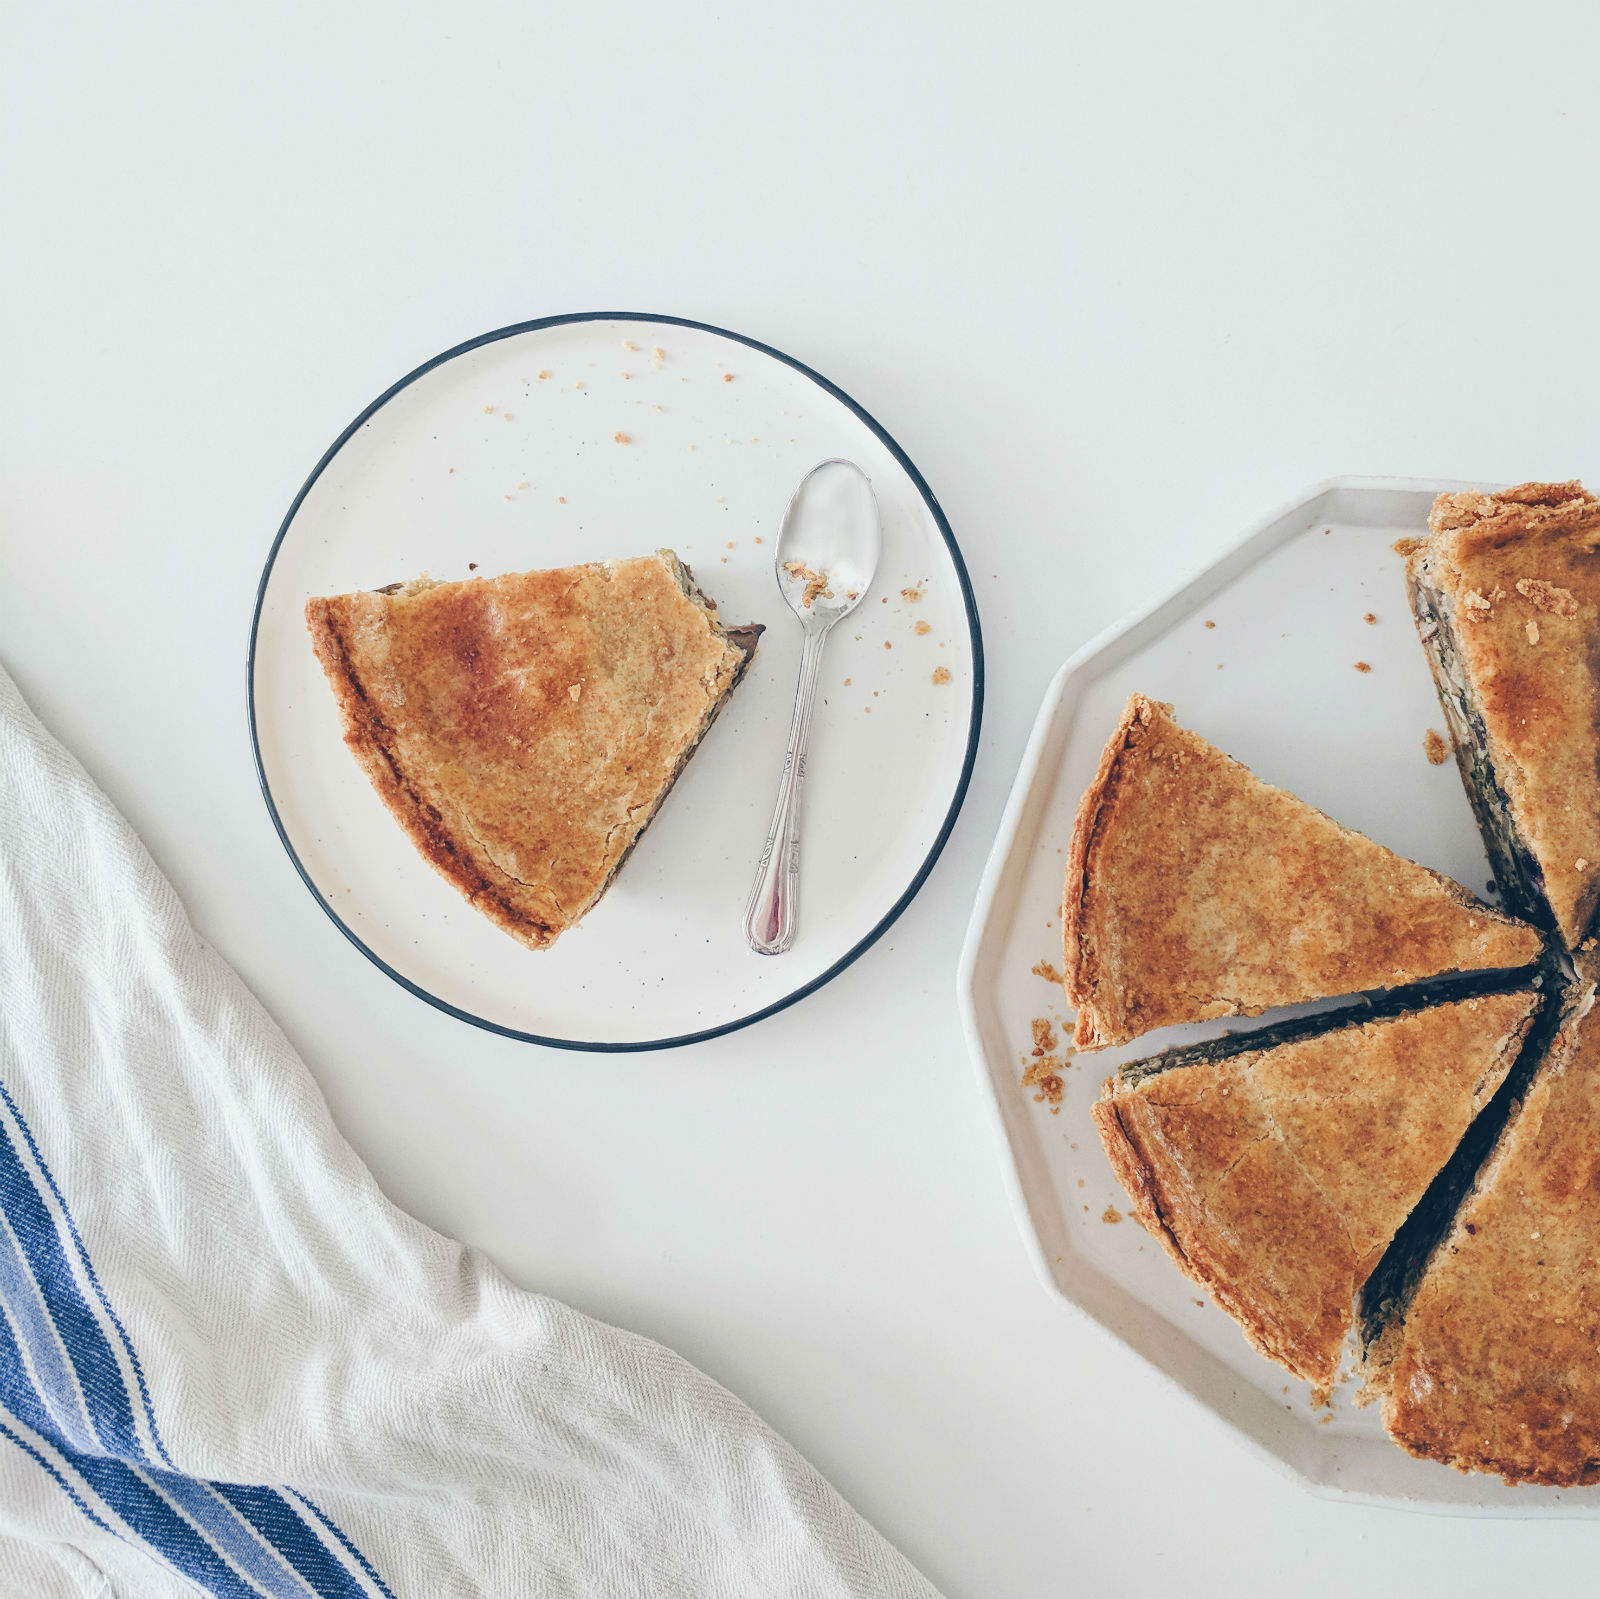 Slice after slice of torta salata (savoury pie) with mushroom and blueberry.